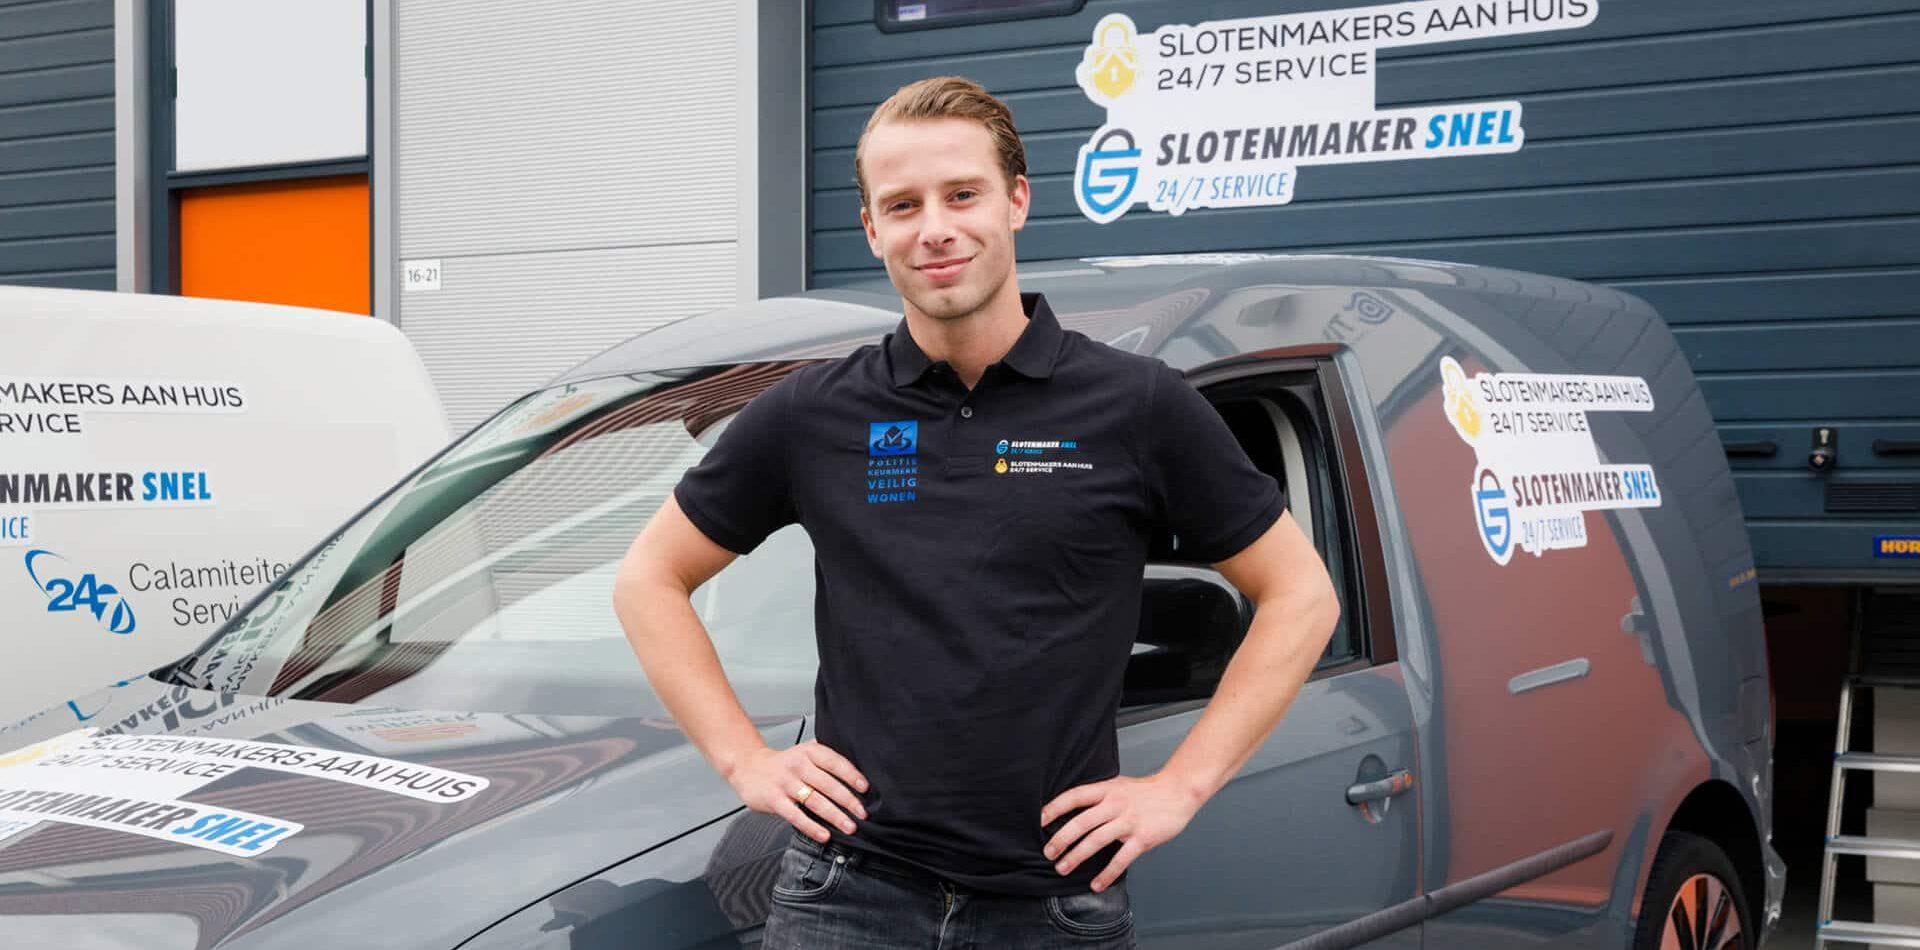 Slotenmaker Schagen